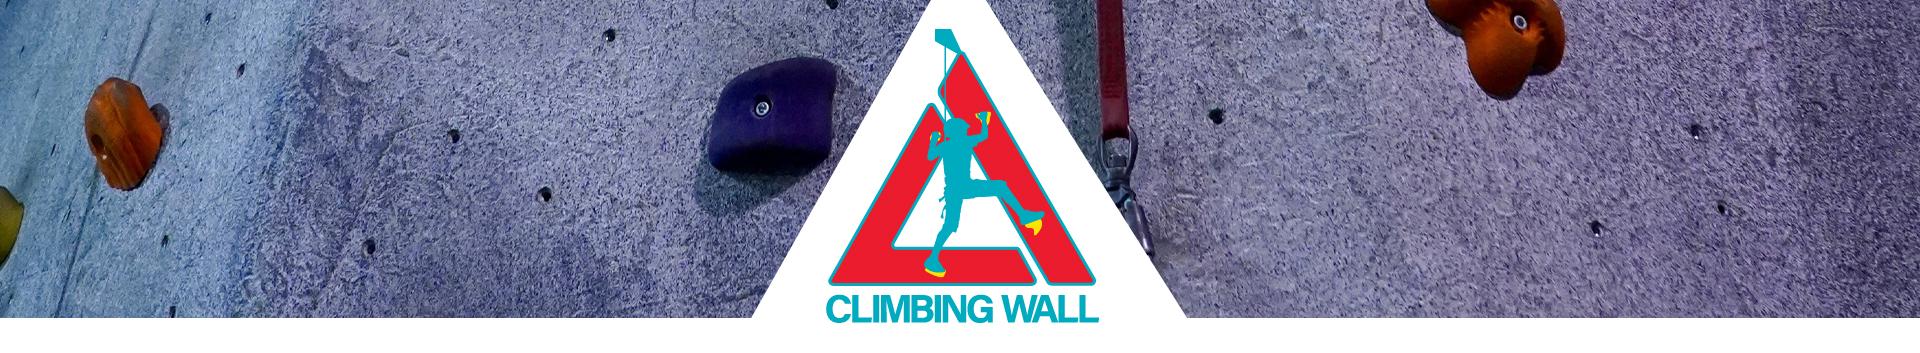 activekidz indoor climbing wall